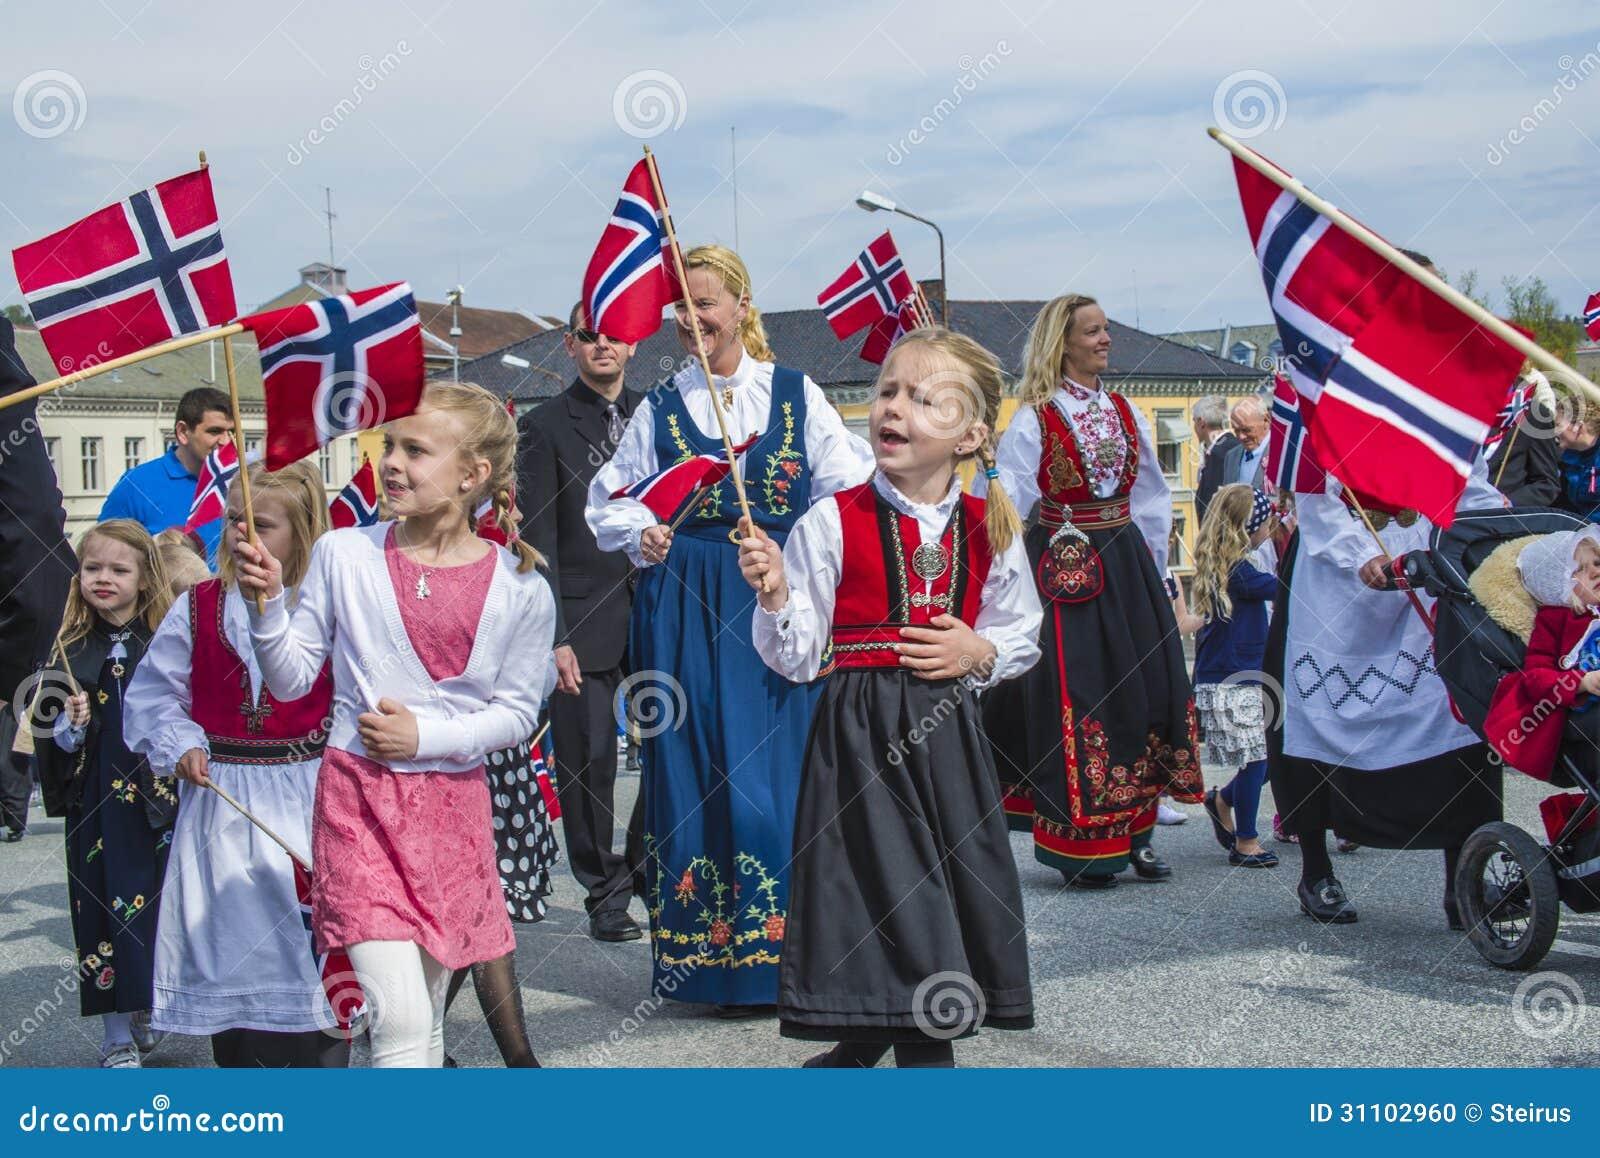 norsk eskortejente time and date oslo